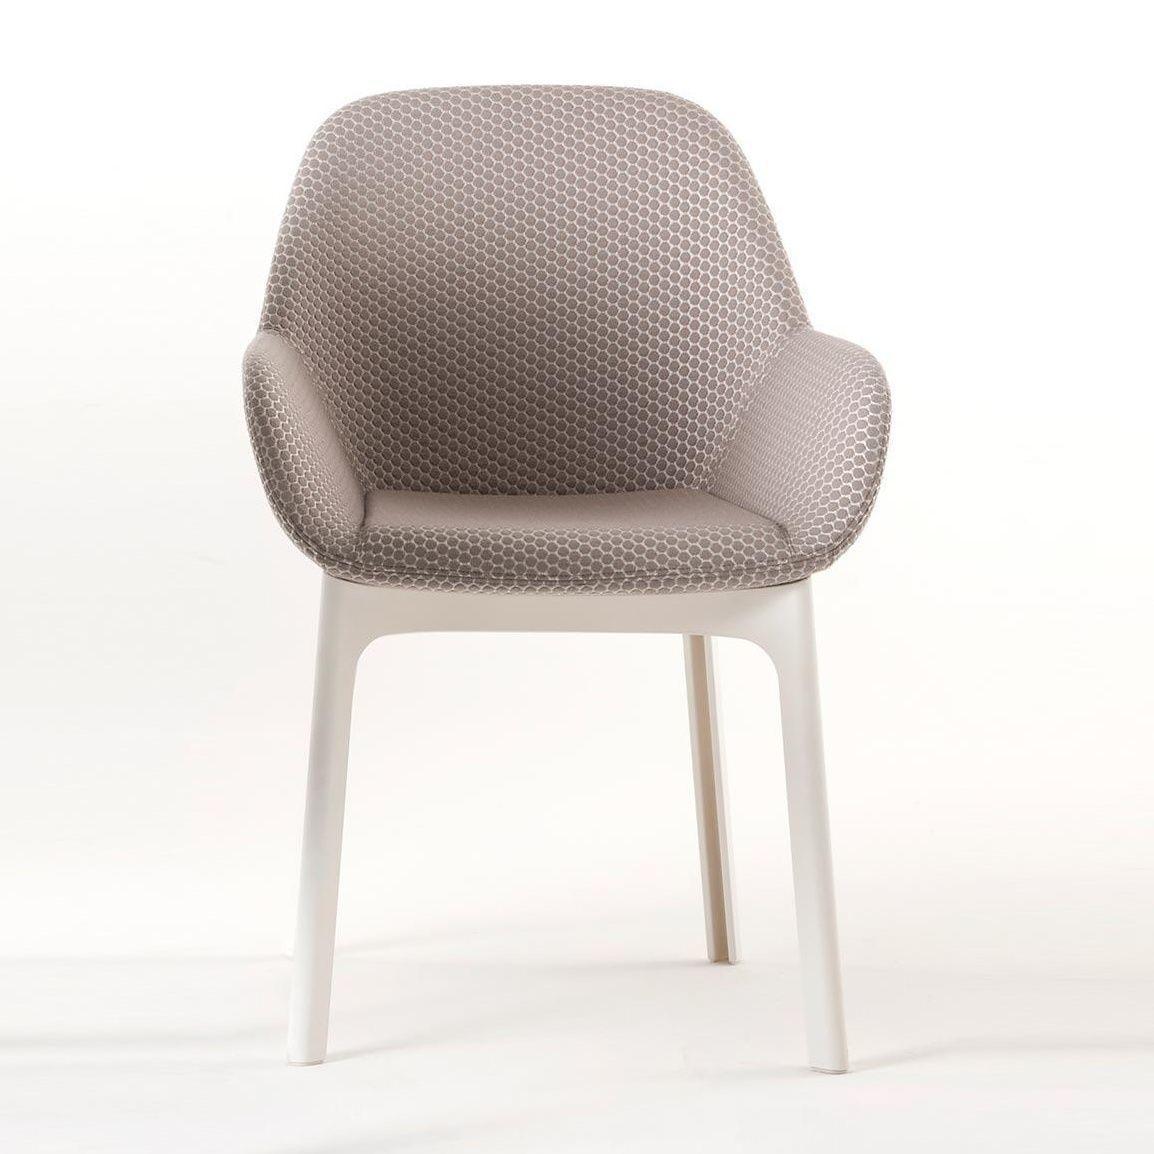 Clap armlehnstuhl stoff kartell for Armlehnstuhl grau stoff